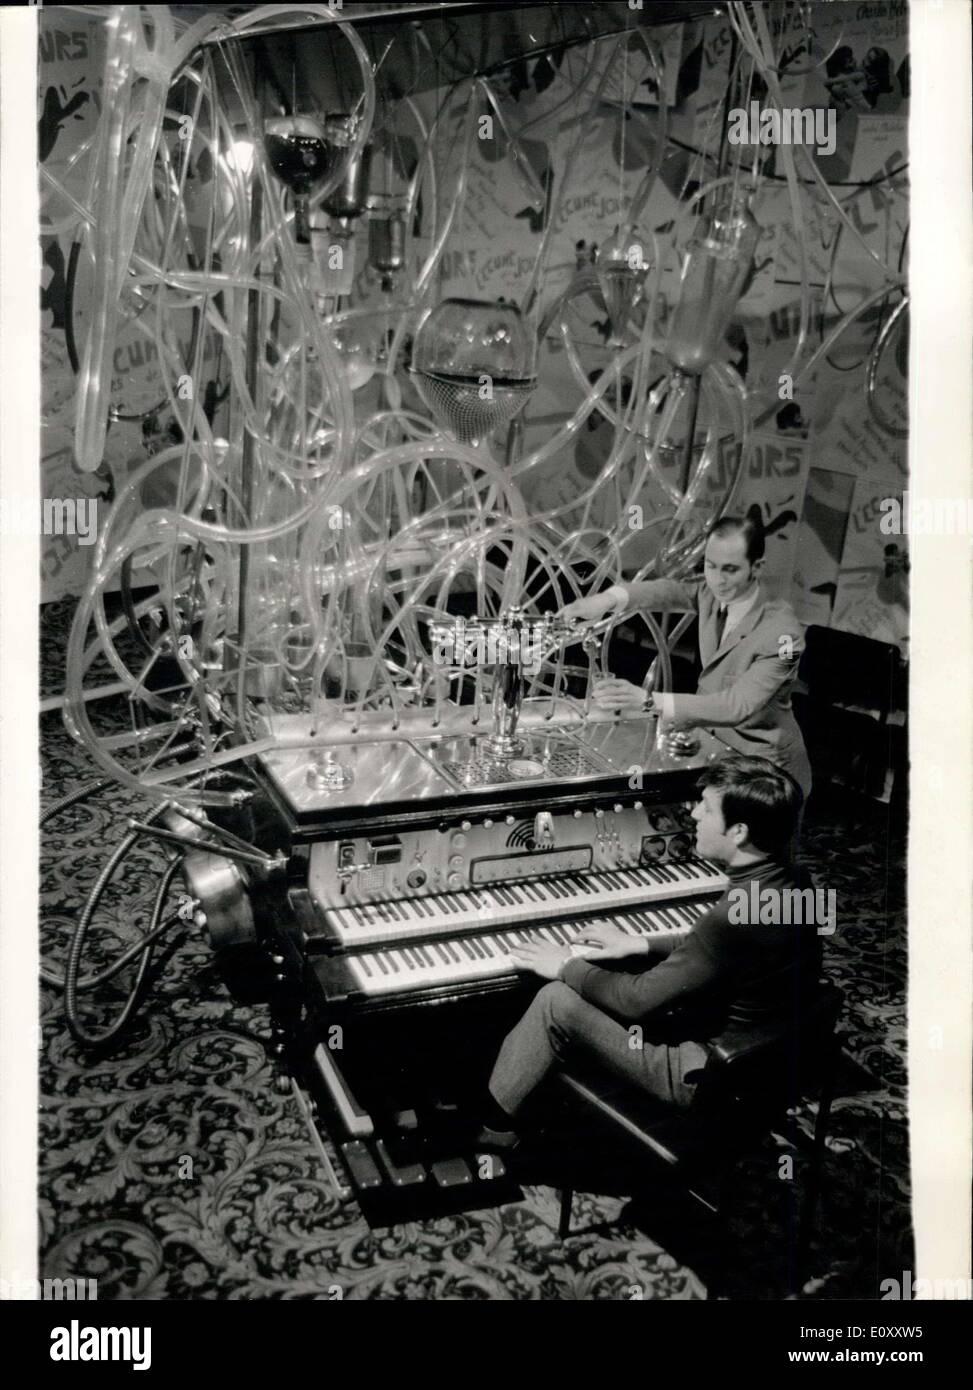 Mar  20, 1968 - Piano Cocktail' for Boris Vian's film: On